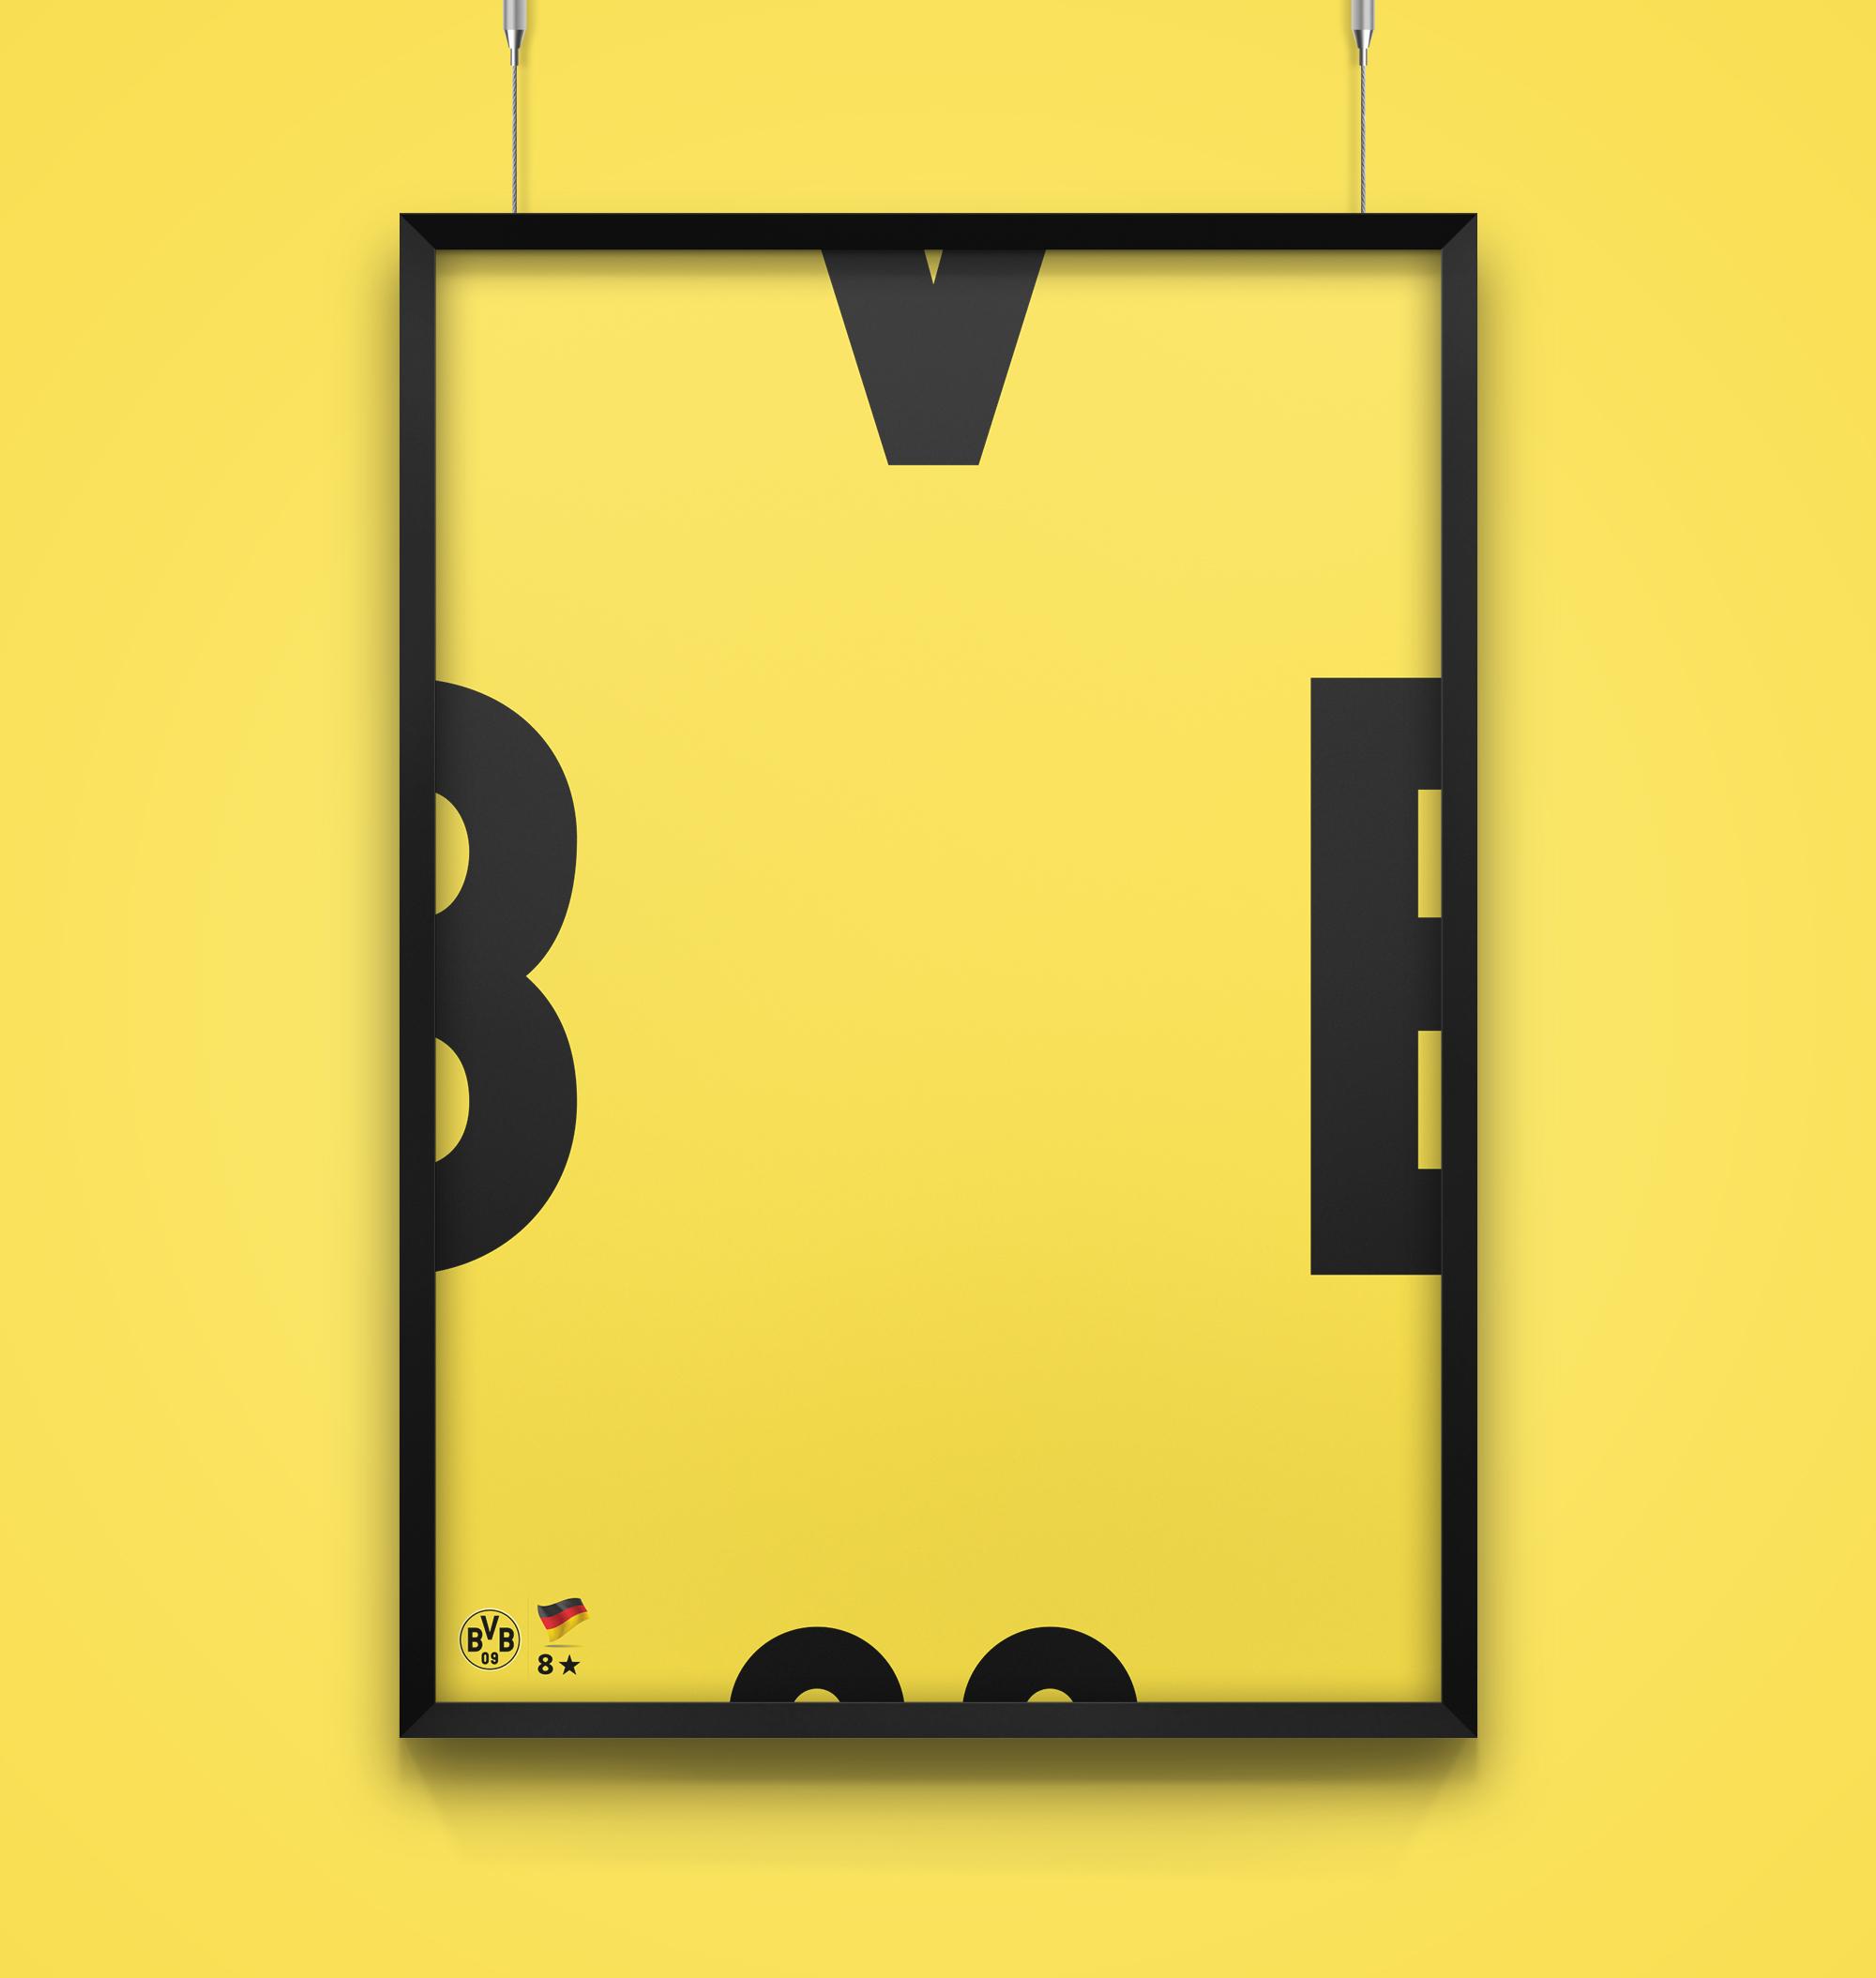 raniev-rod-alvarez-diseño-gráfico-queretaro-poster-minimalist-champions-2-borussia-dortmund